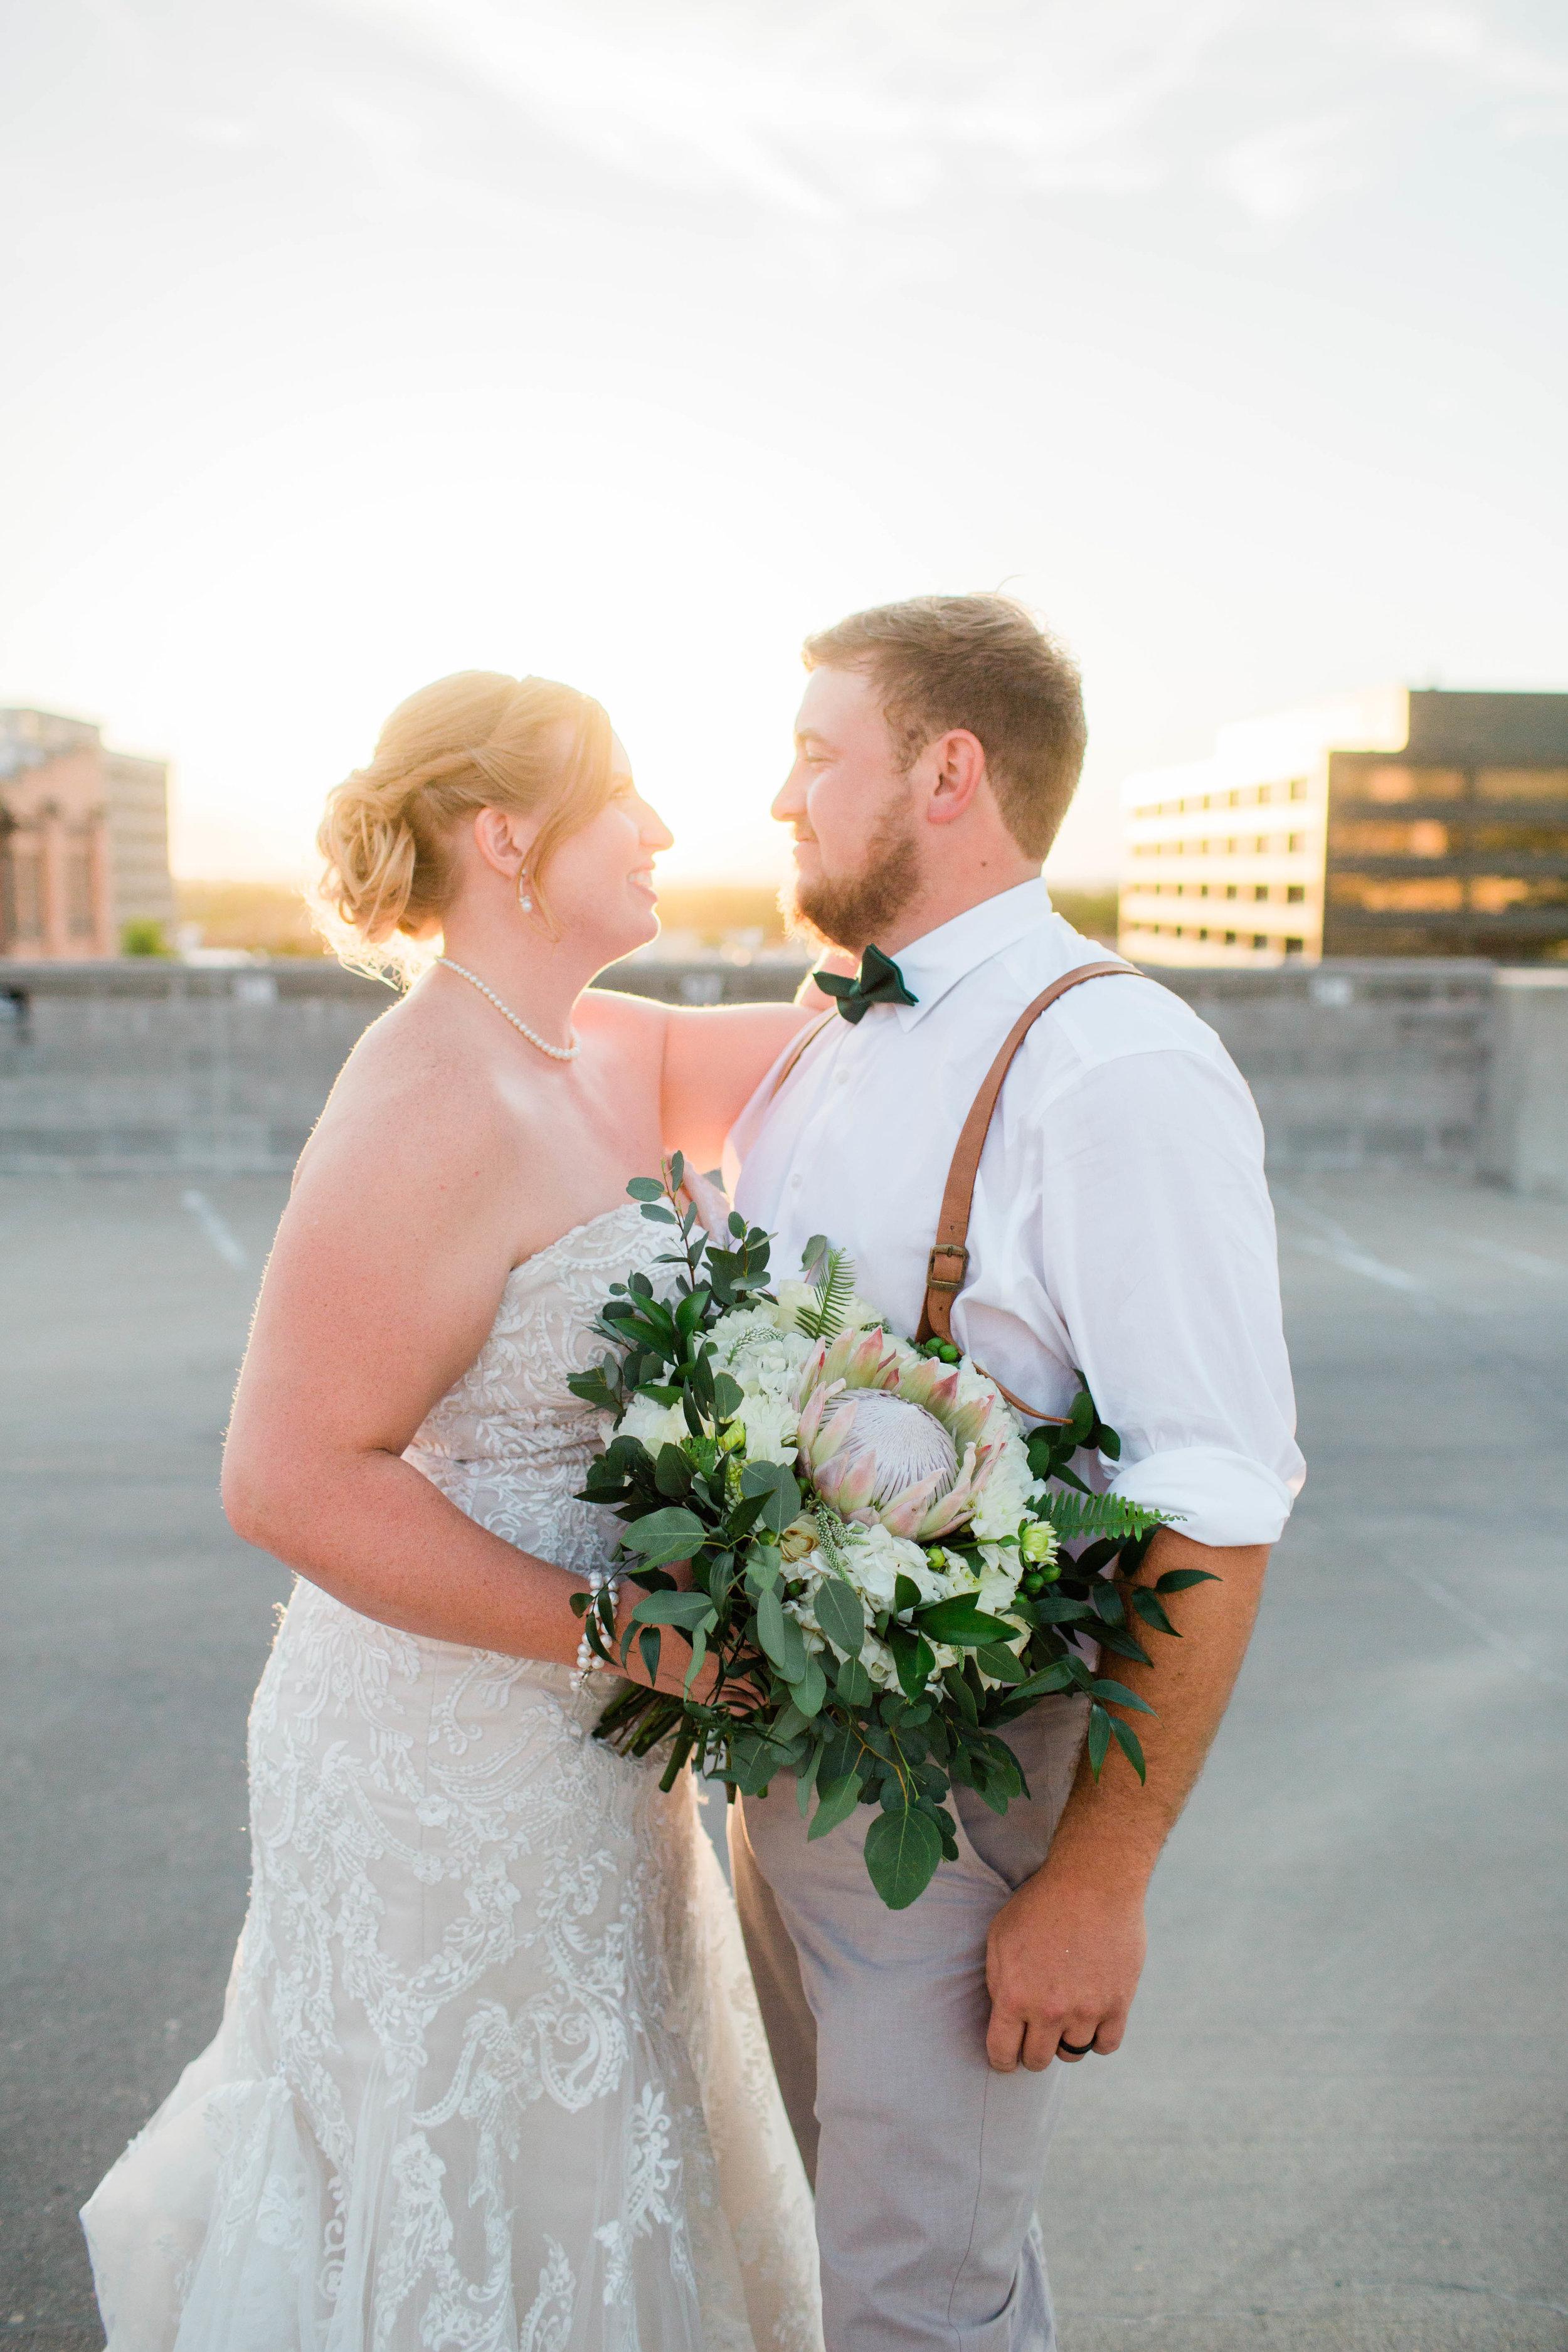 E-Lydia-Rohan-Downtown-Boise-Wedding-2.jpg